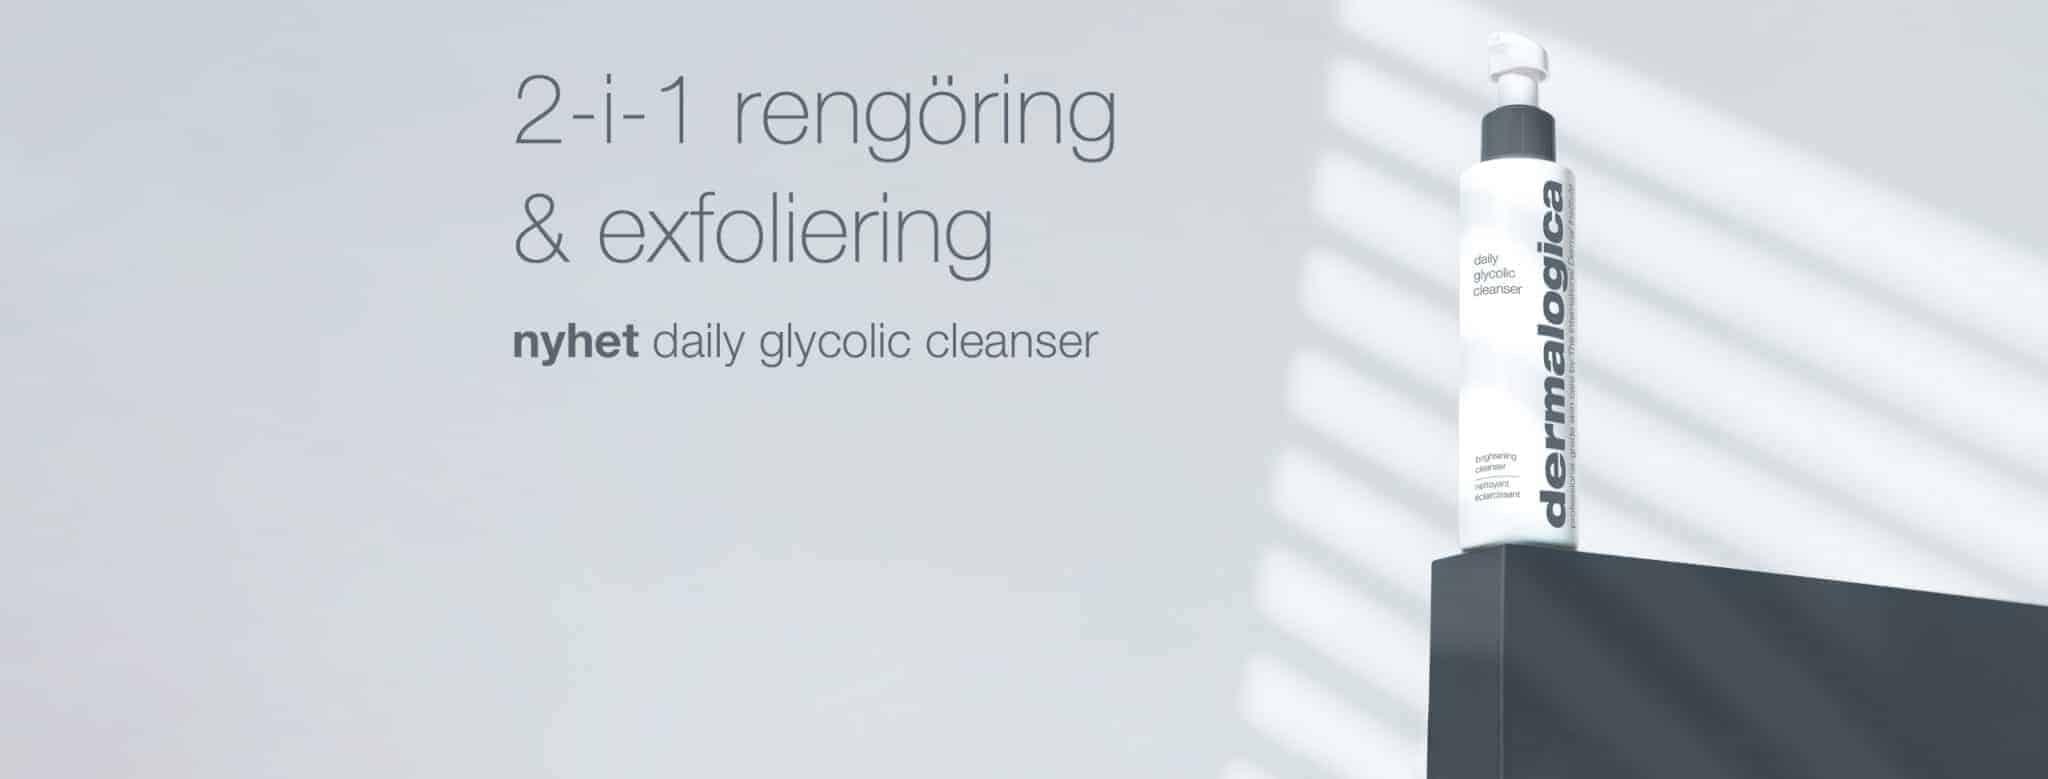 Dermalogica Daily Glycolic Cleanser desktop banner